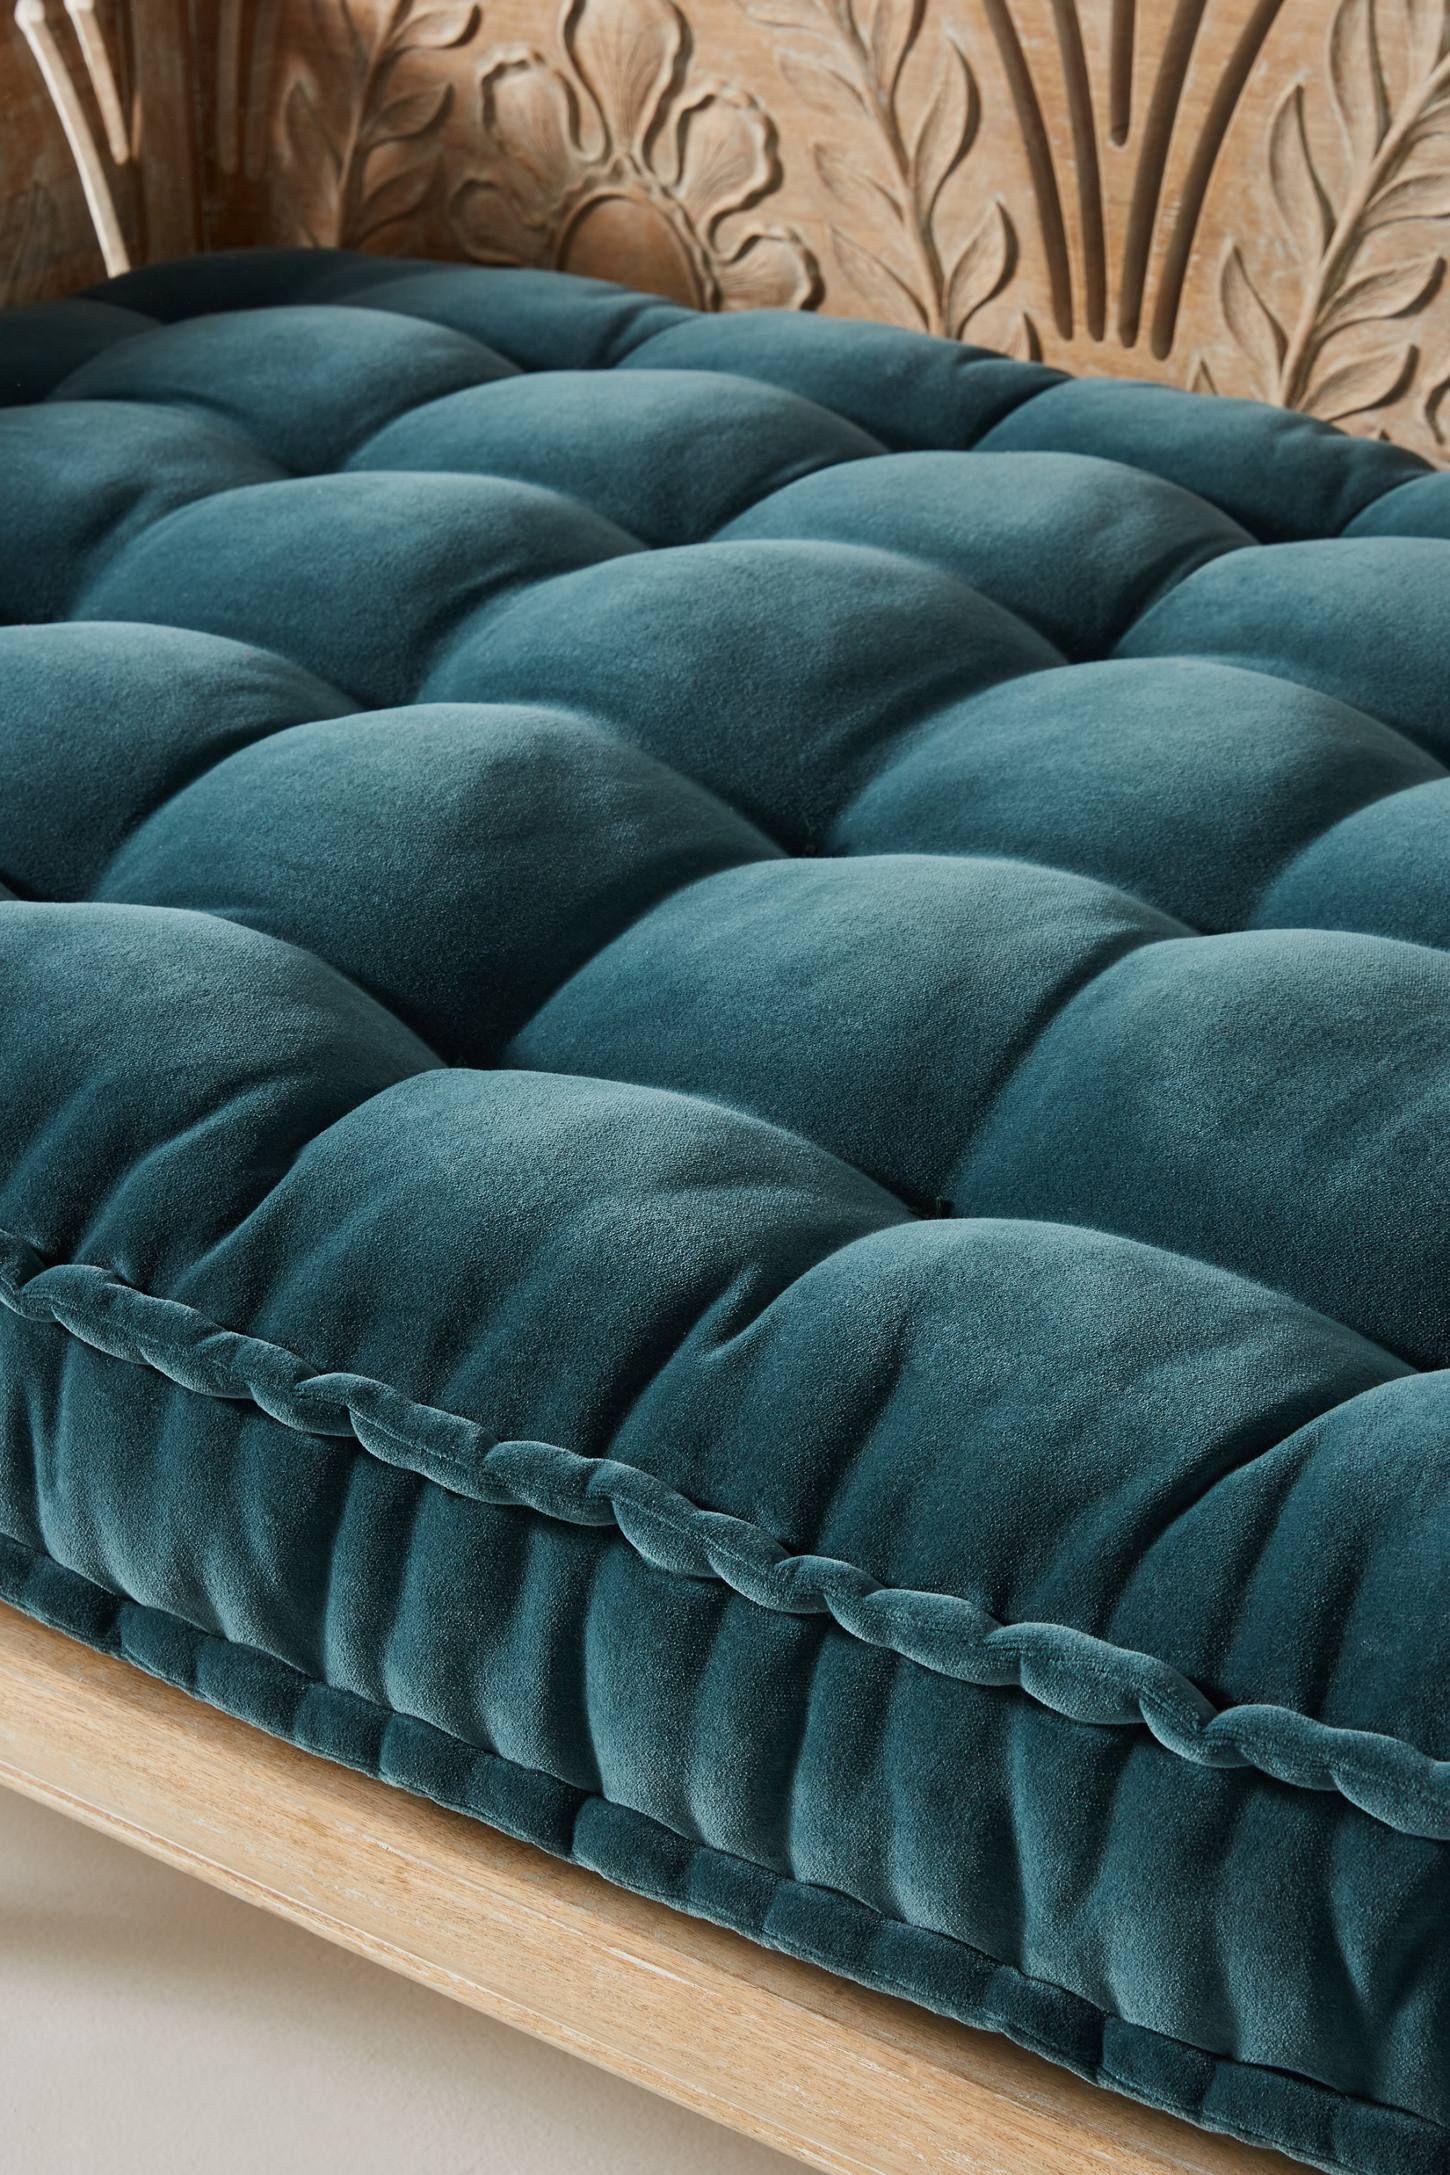 Velvet Daybed Cushion In 2020 Daybed Cushion French Mattress Cushion Mattress Cushion